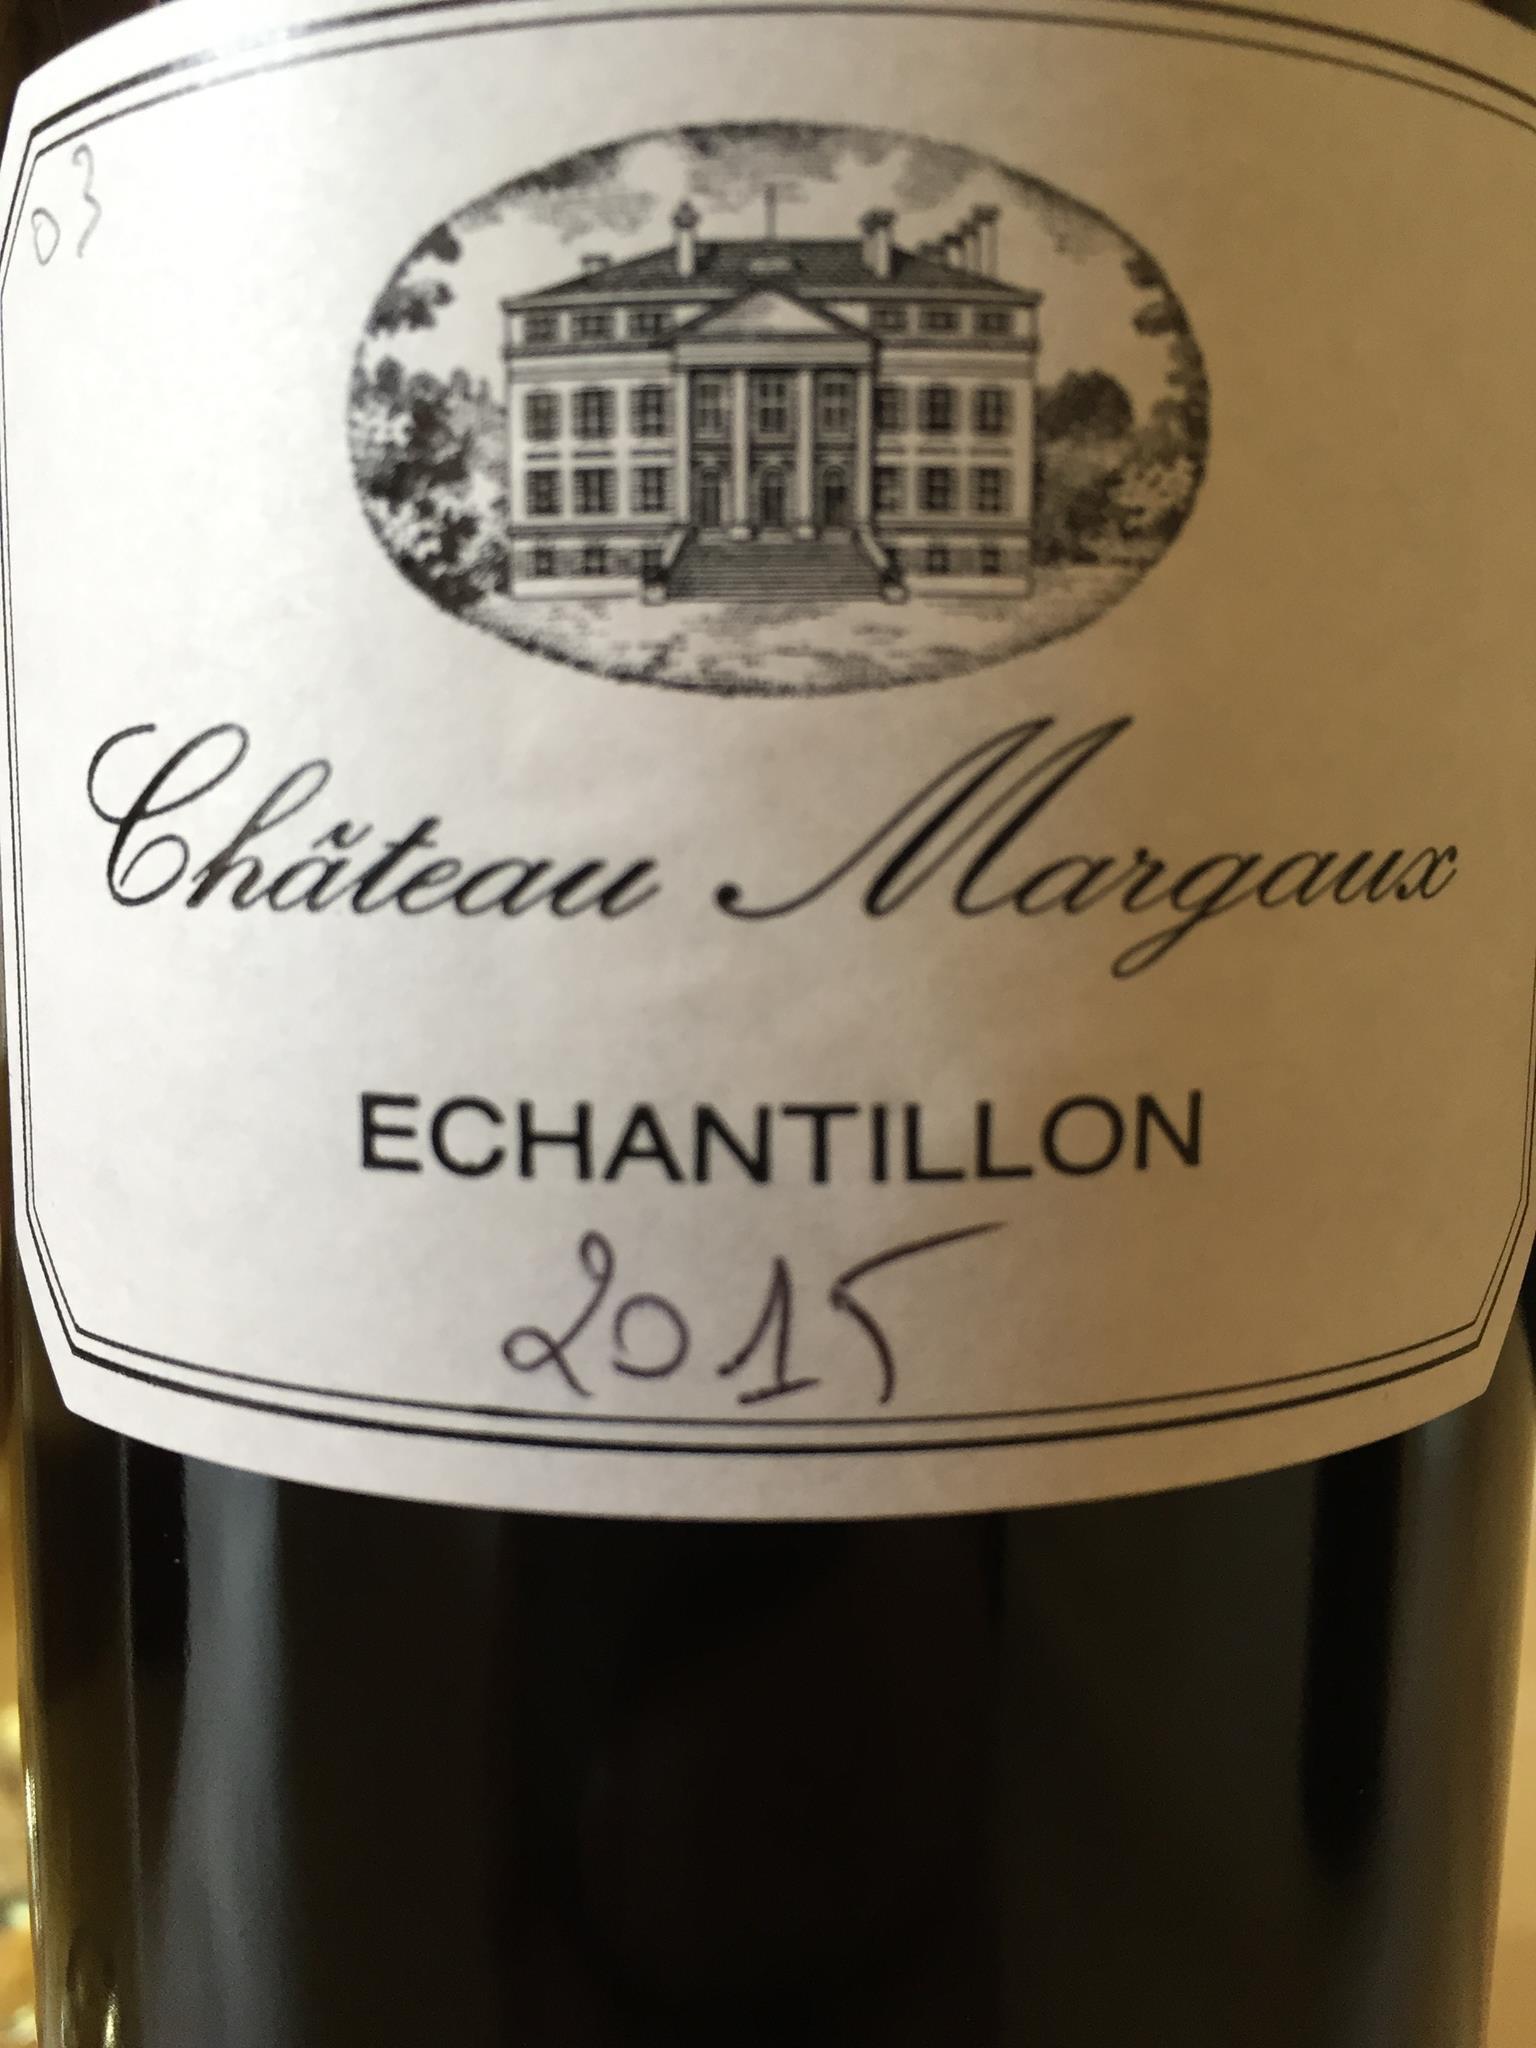 Chateau Margaux 2015 – Margaux, 1er Grand Cru Classe